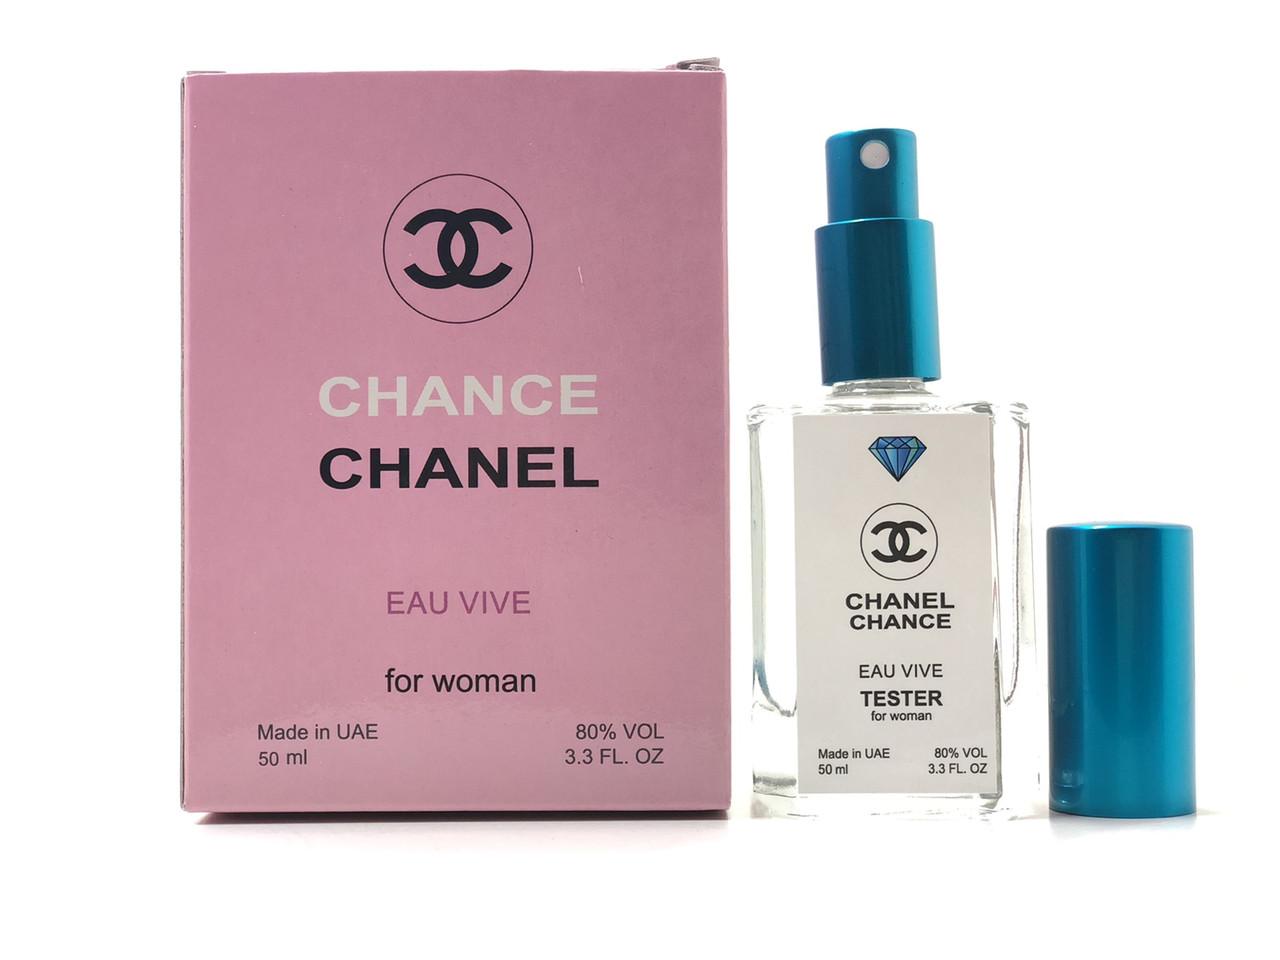 Парфюм Chanel Chance Eau Vive (Шанель Шанс Вив) 50 мл Diamond - реплика